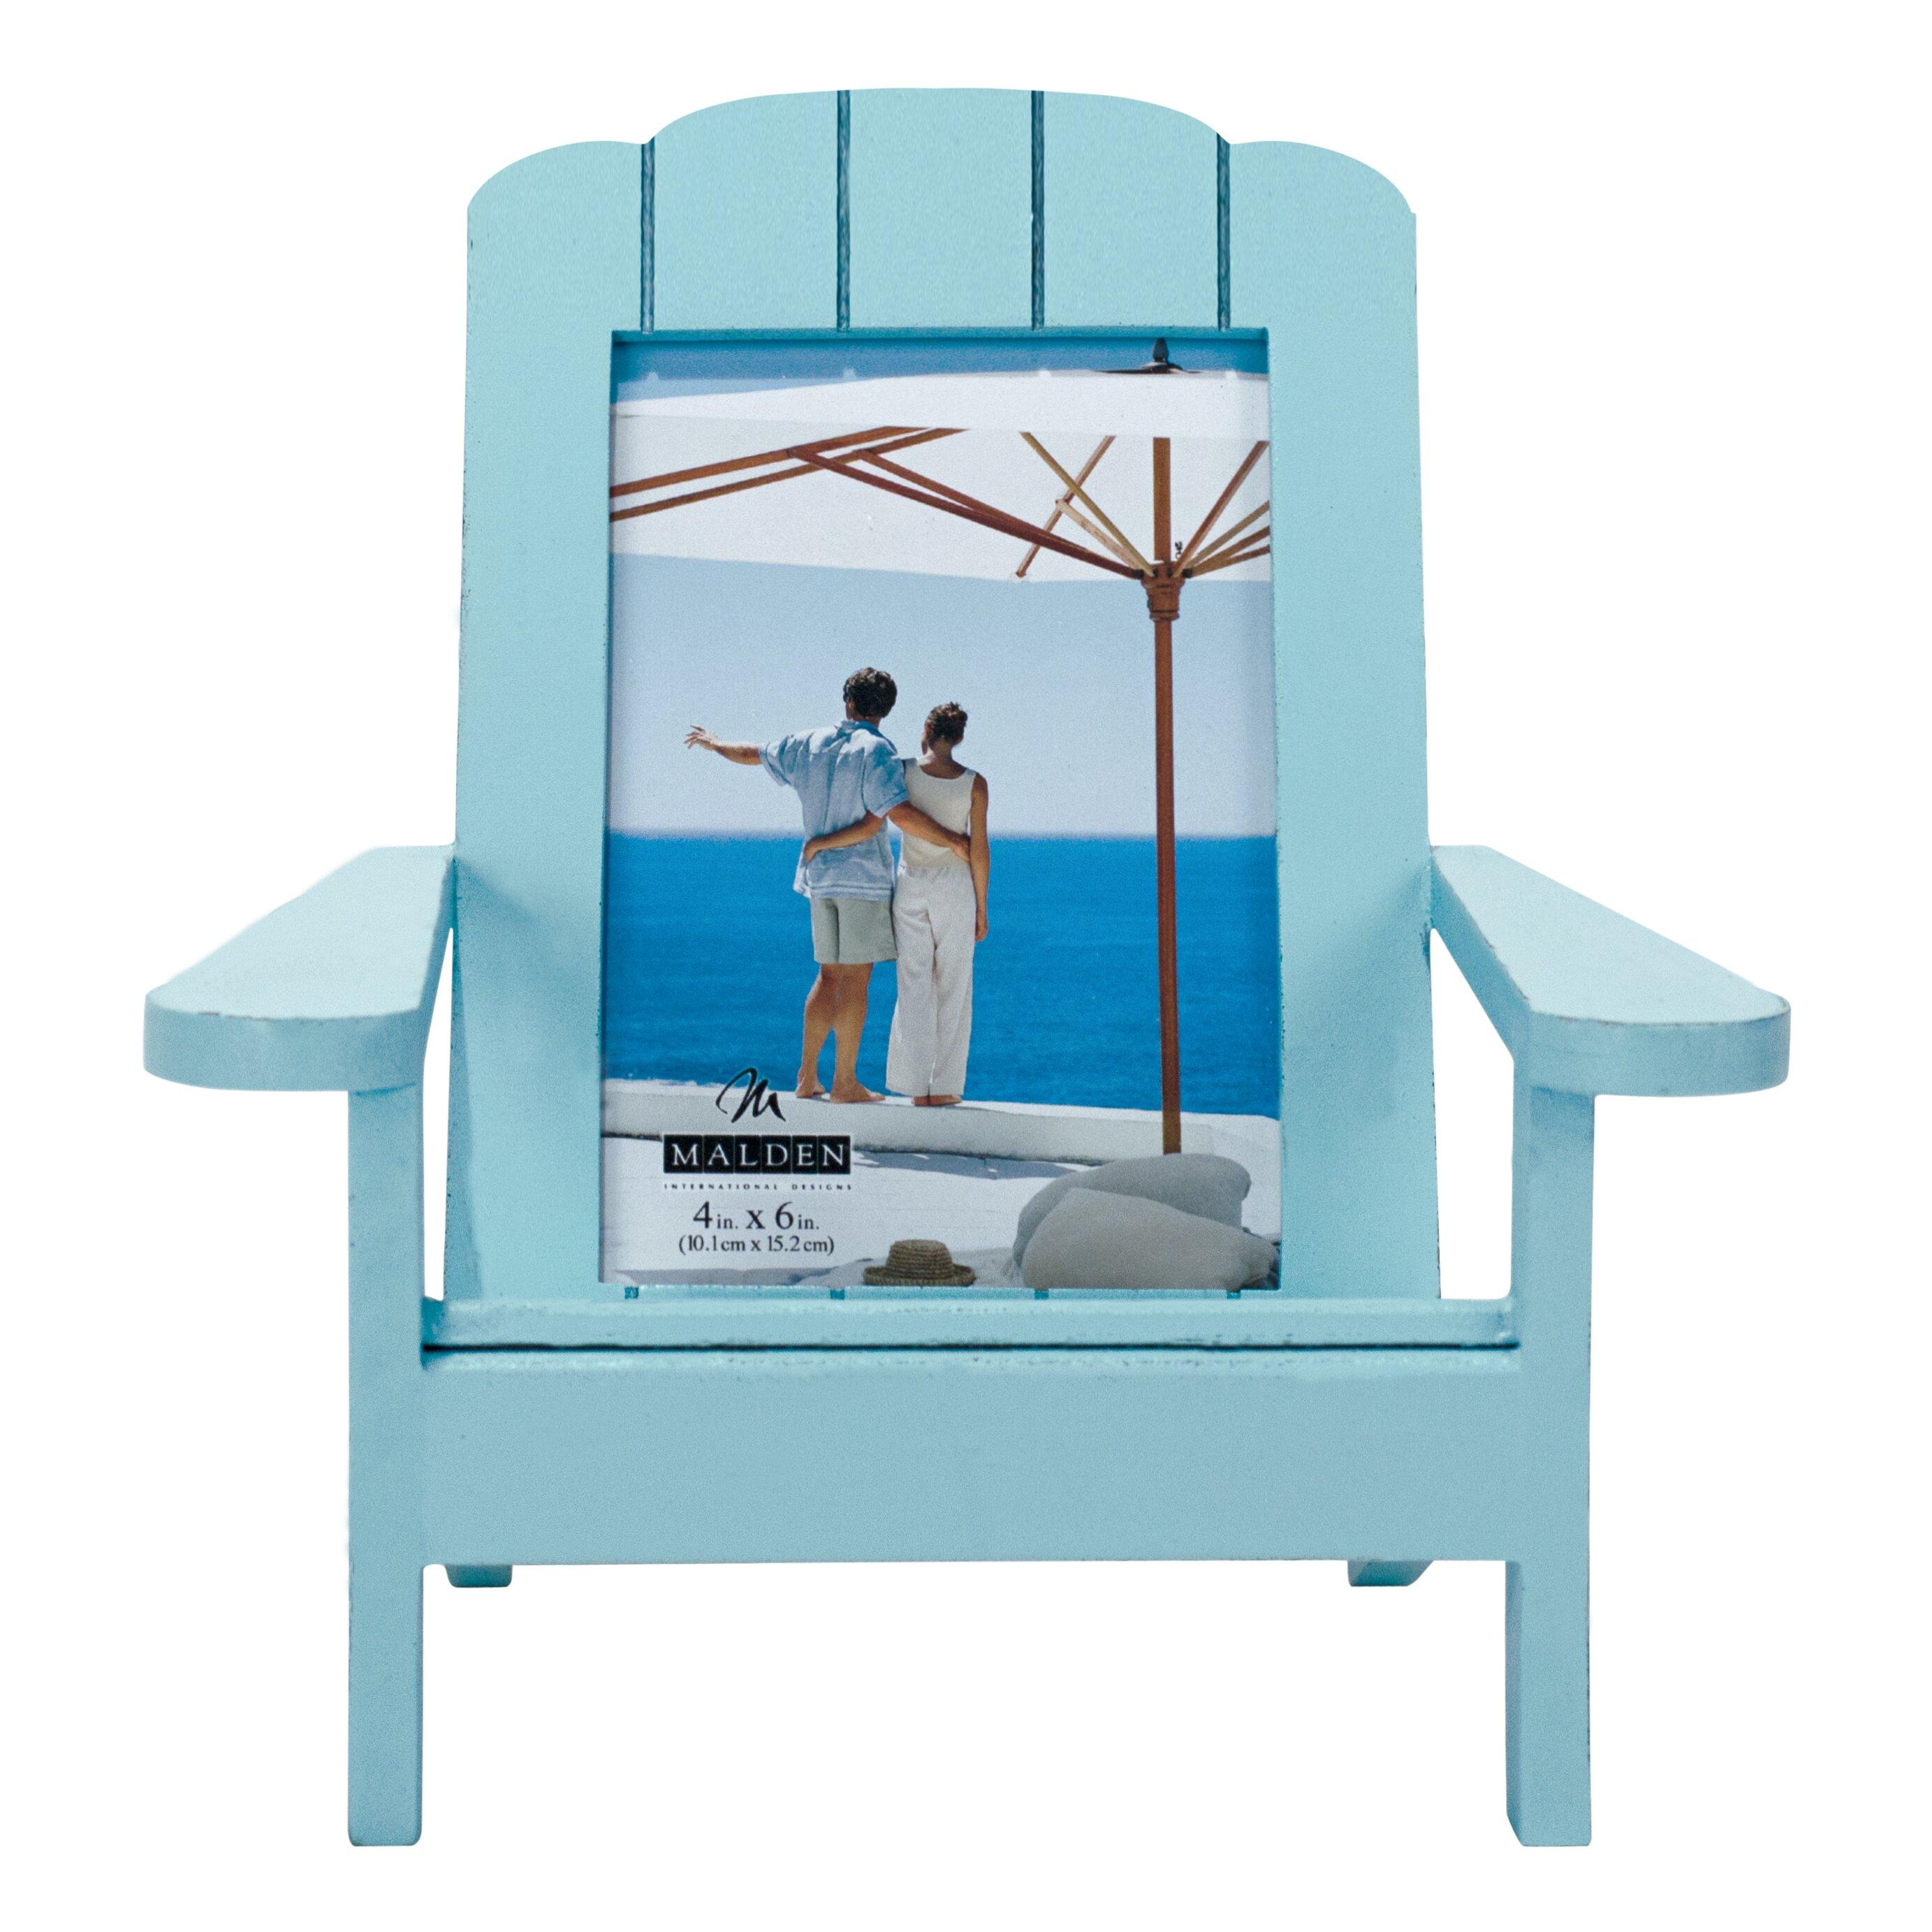 Malden Adirondack Chair Picture Frame Reviews Wayfair